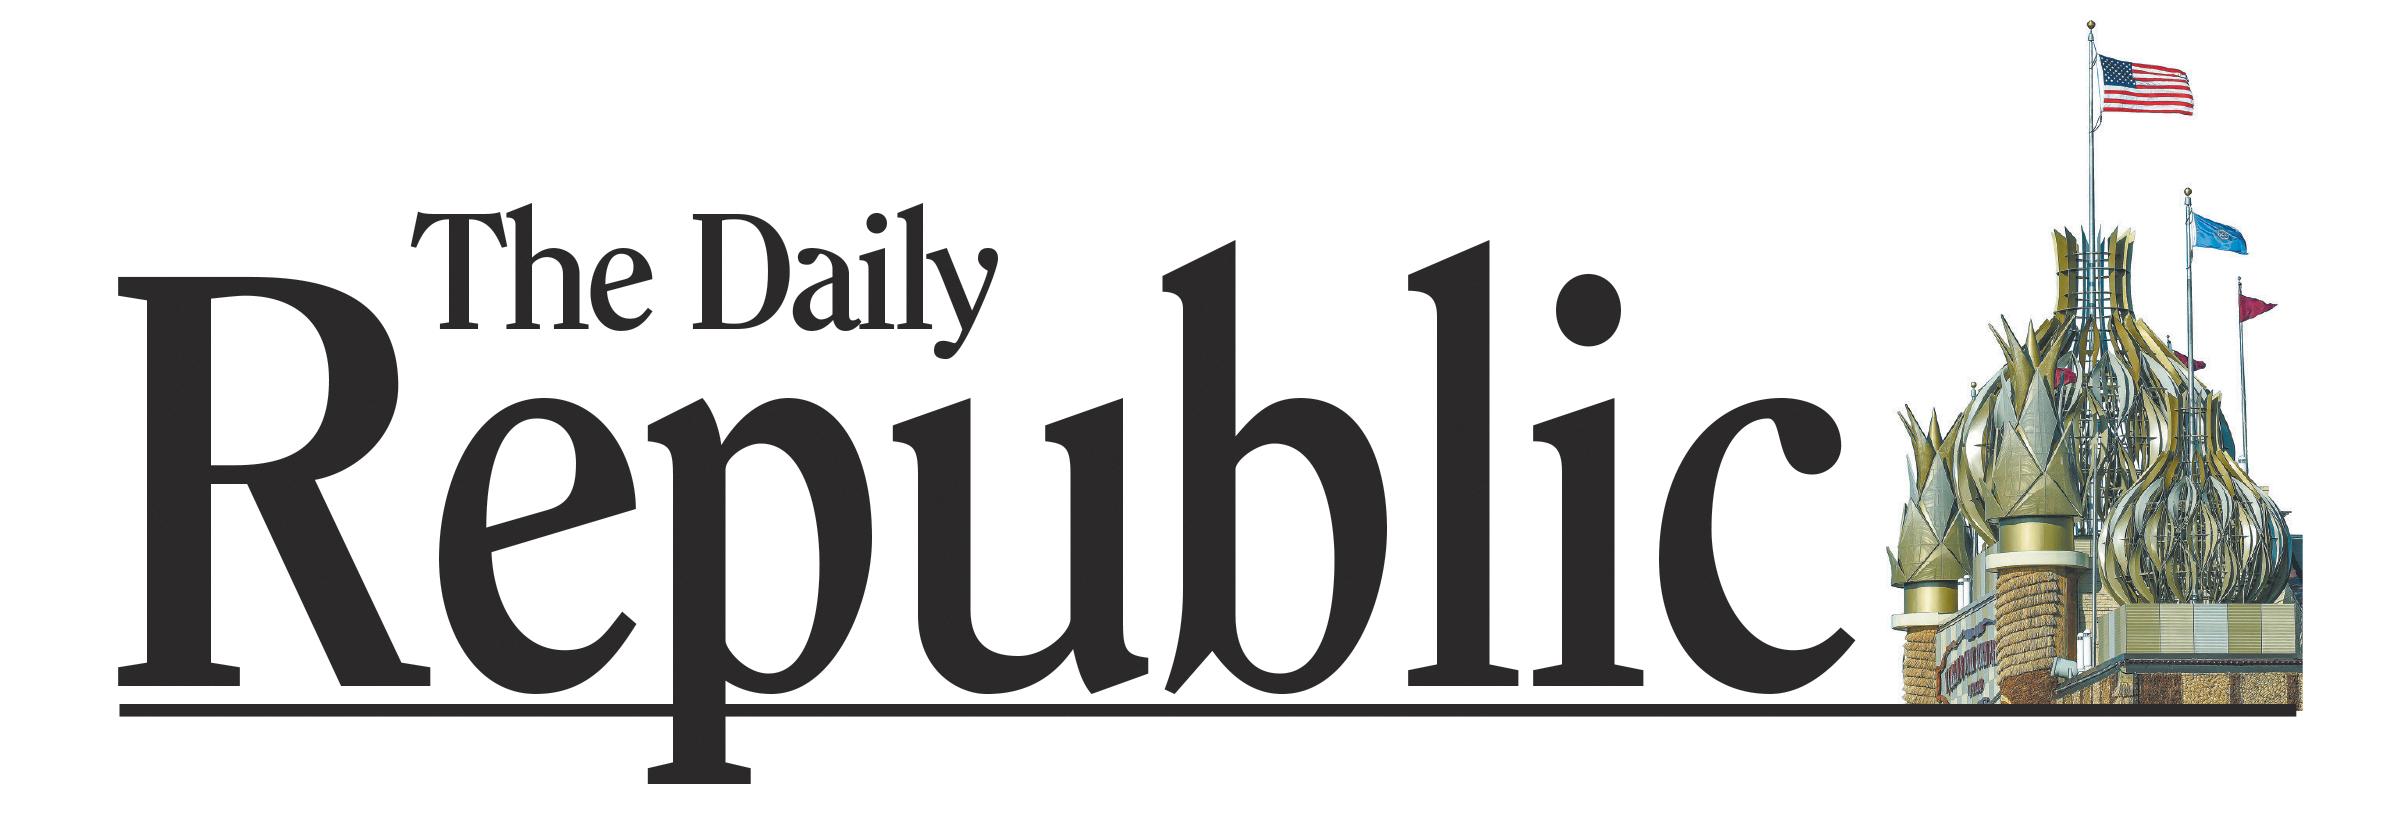 Mitchell Daily Republic